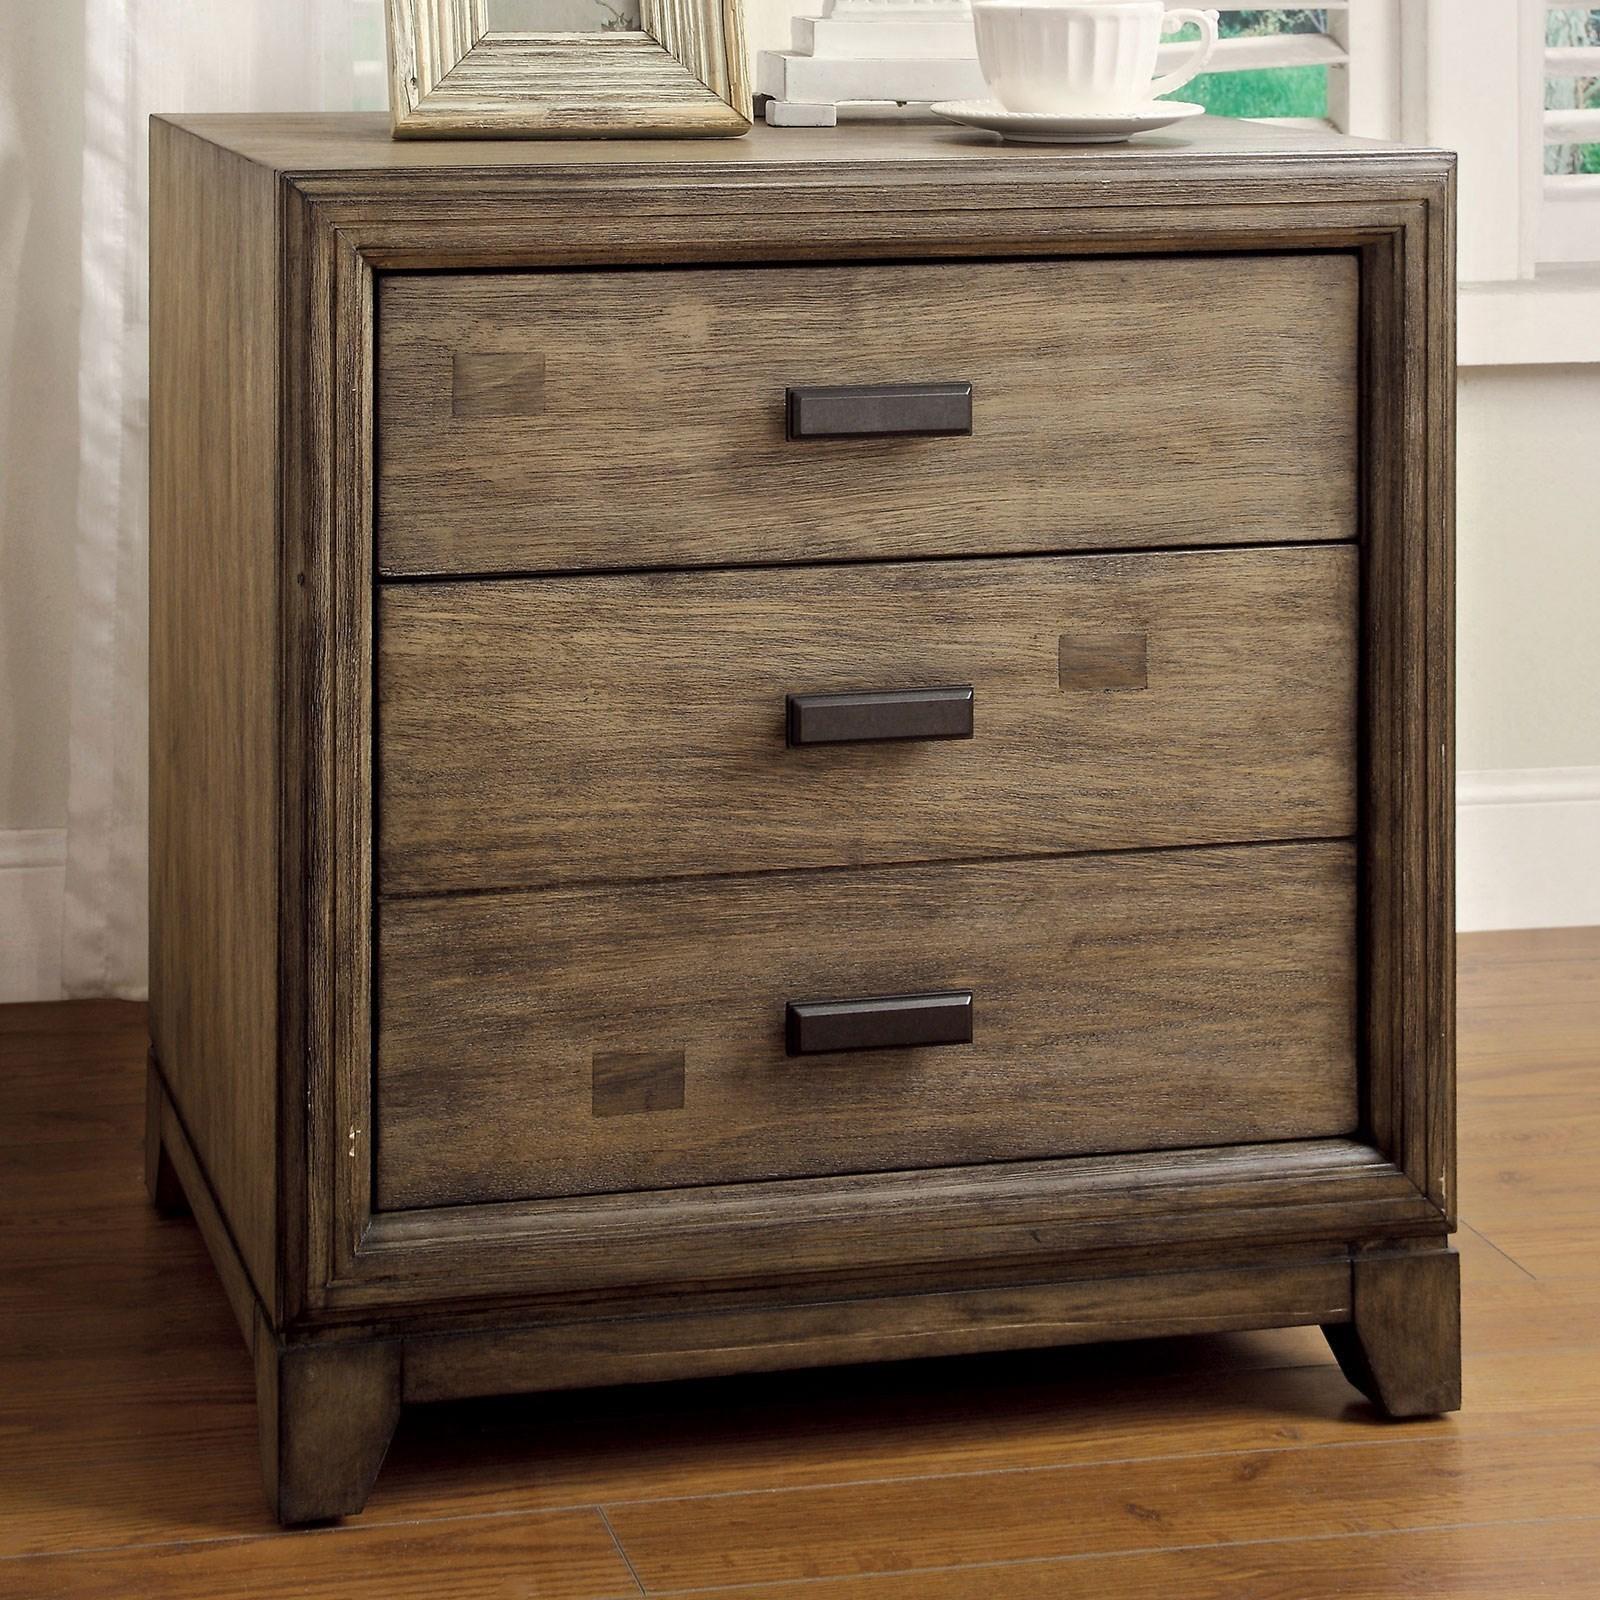 Antler Nightstand at Household Furniture